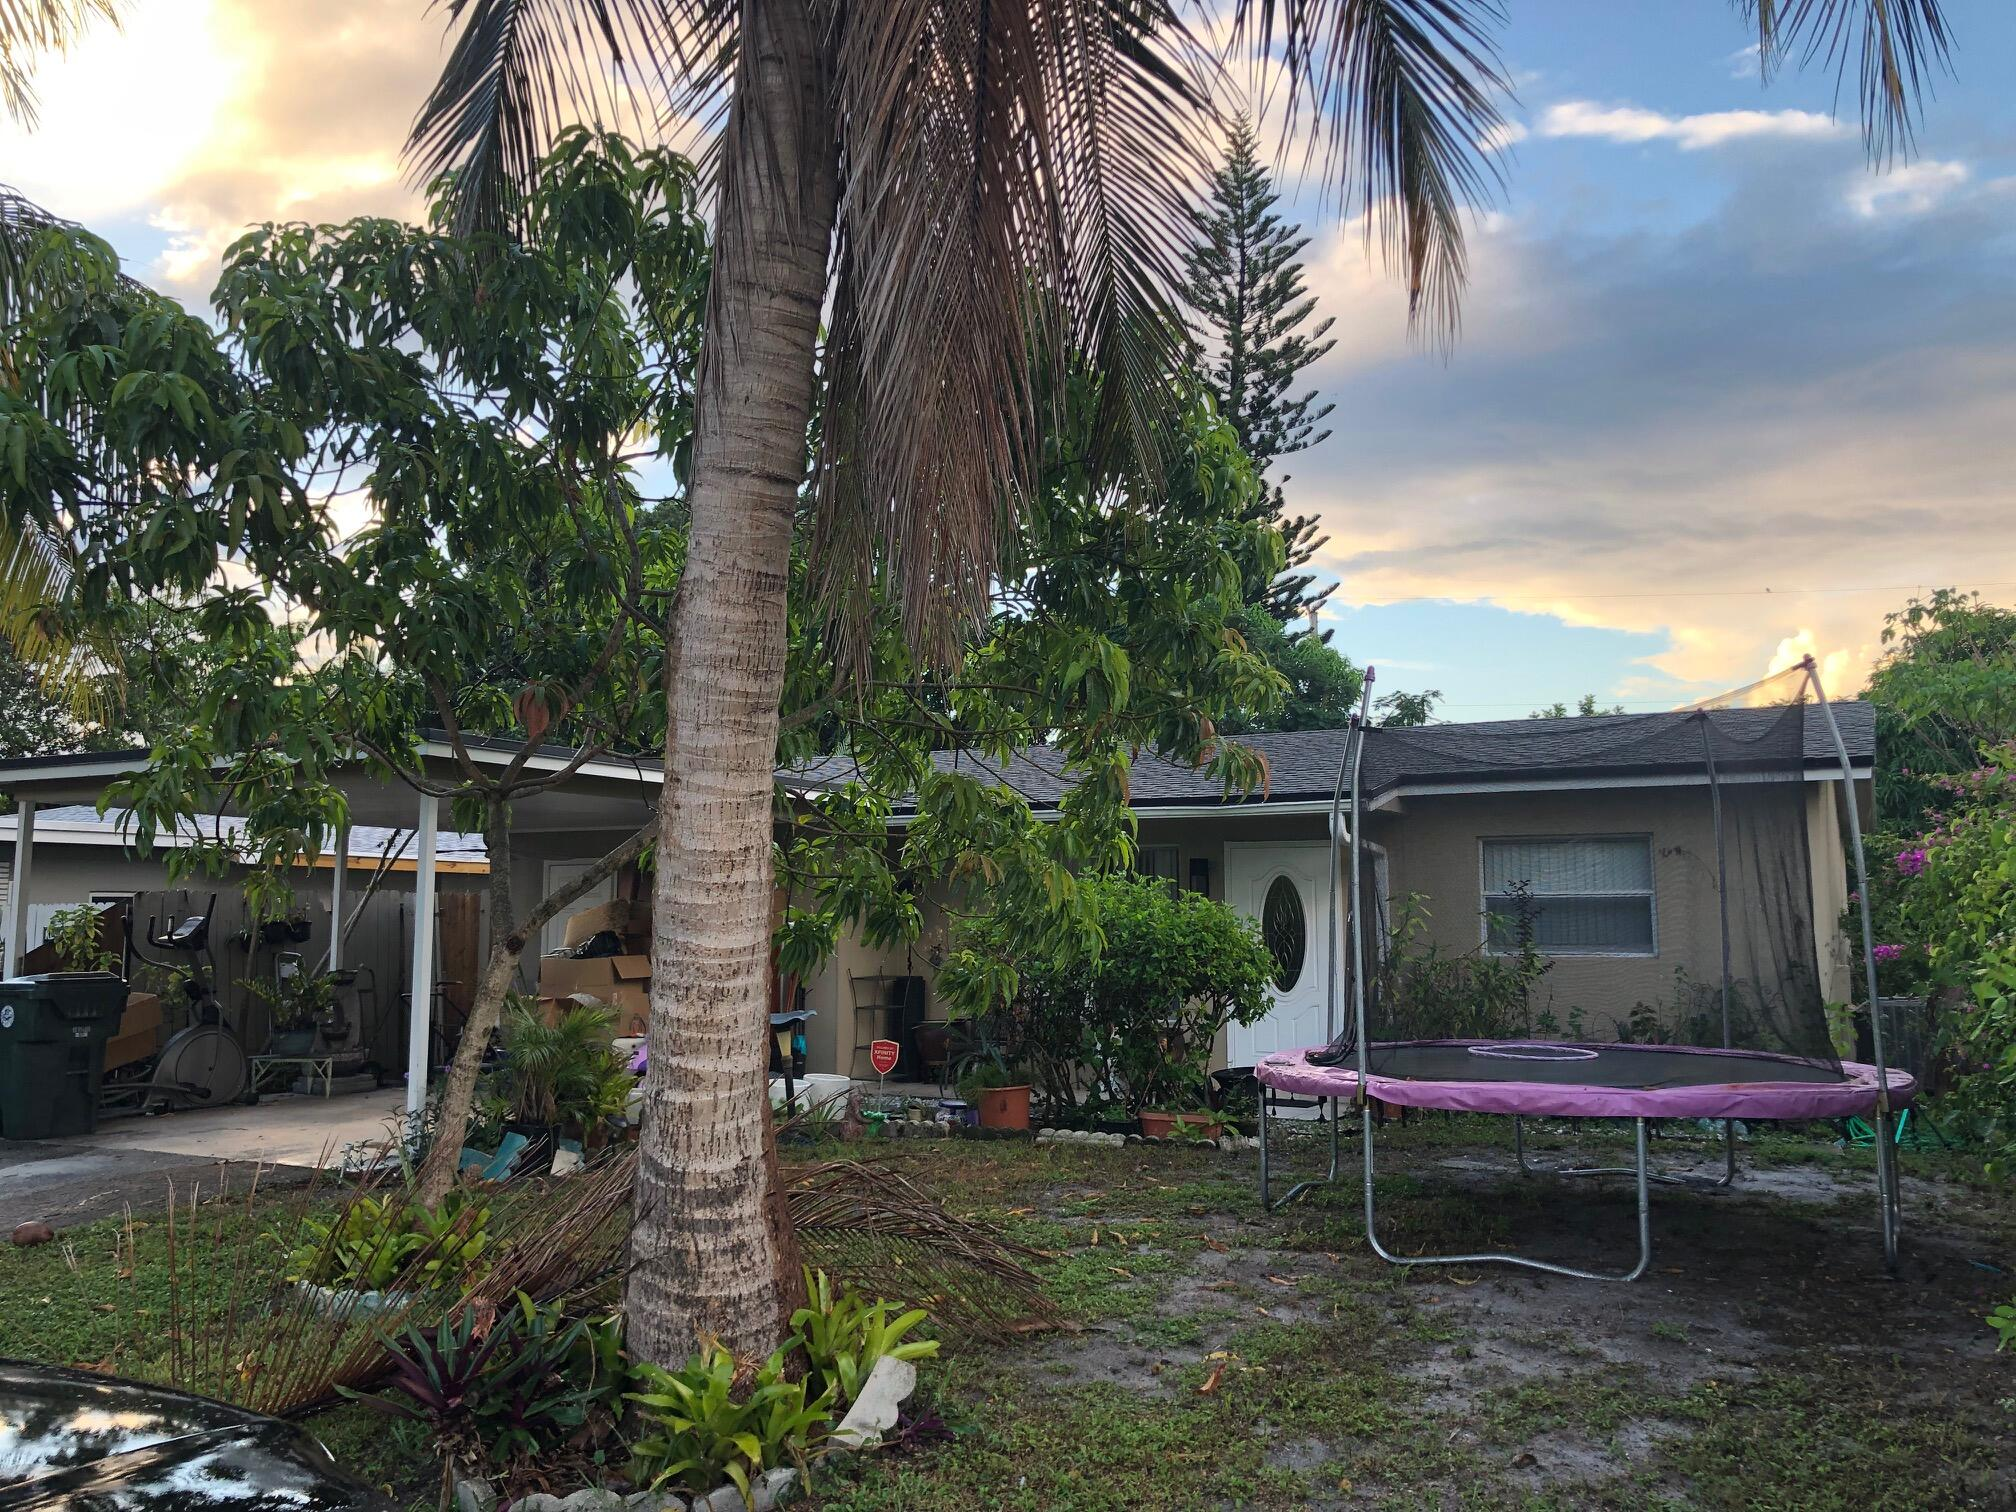 160 Forsyth Street, Boca Raton, FL 33487